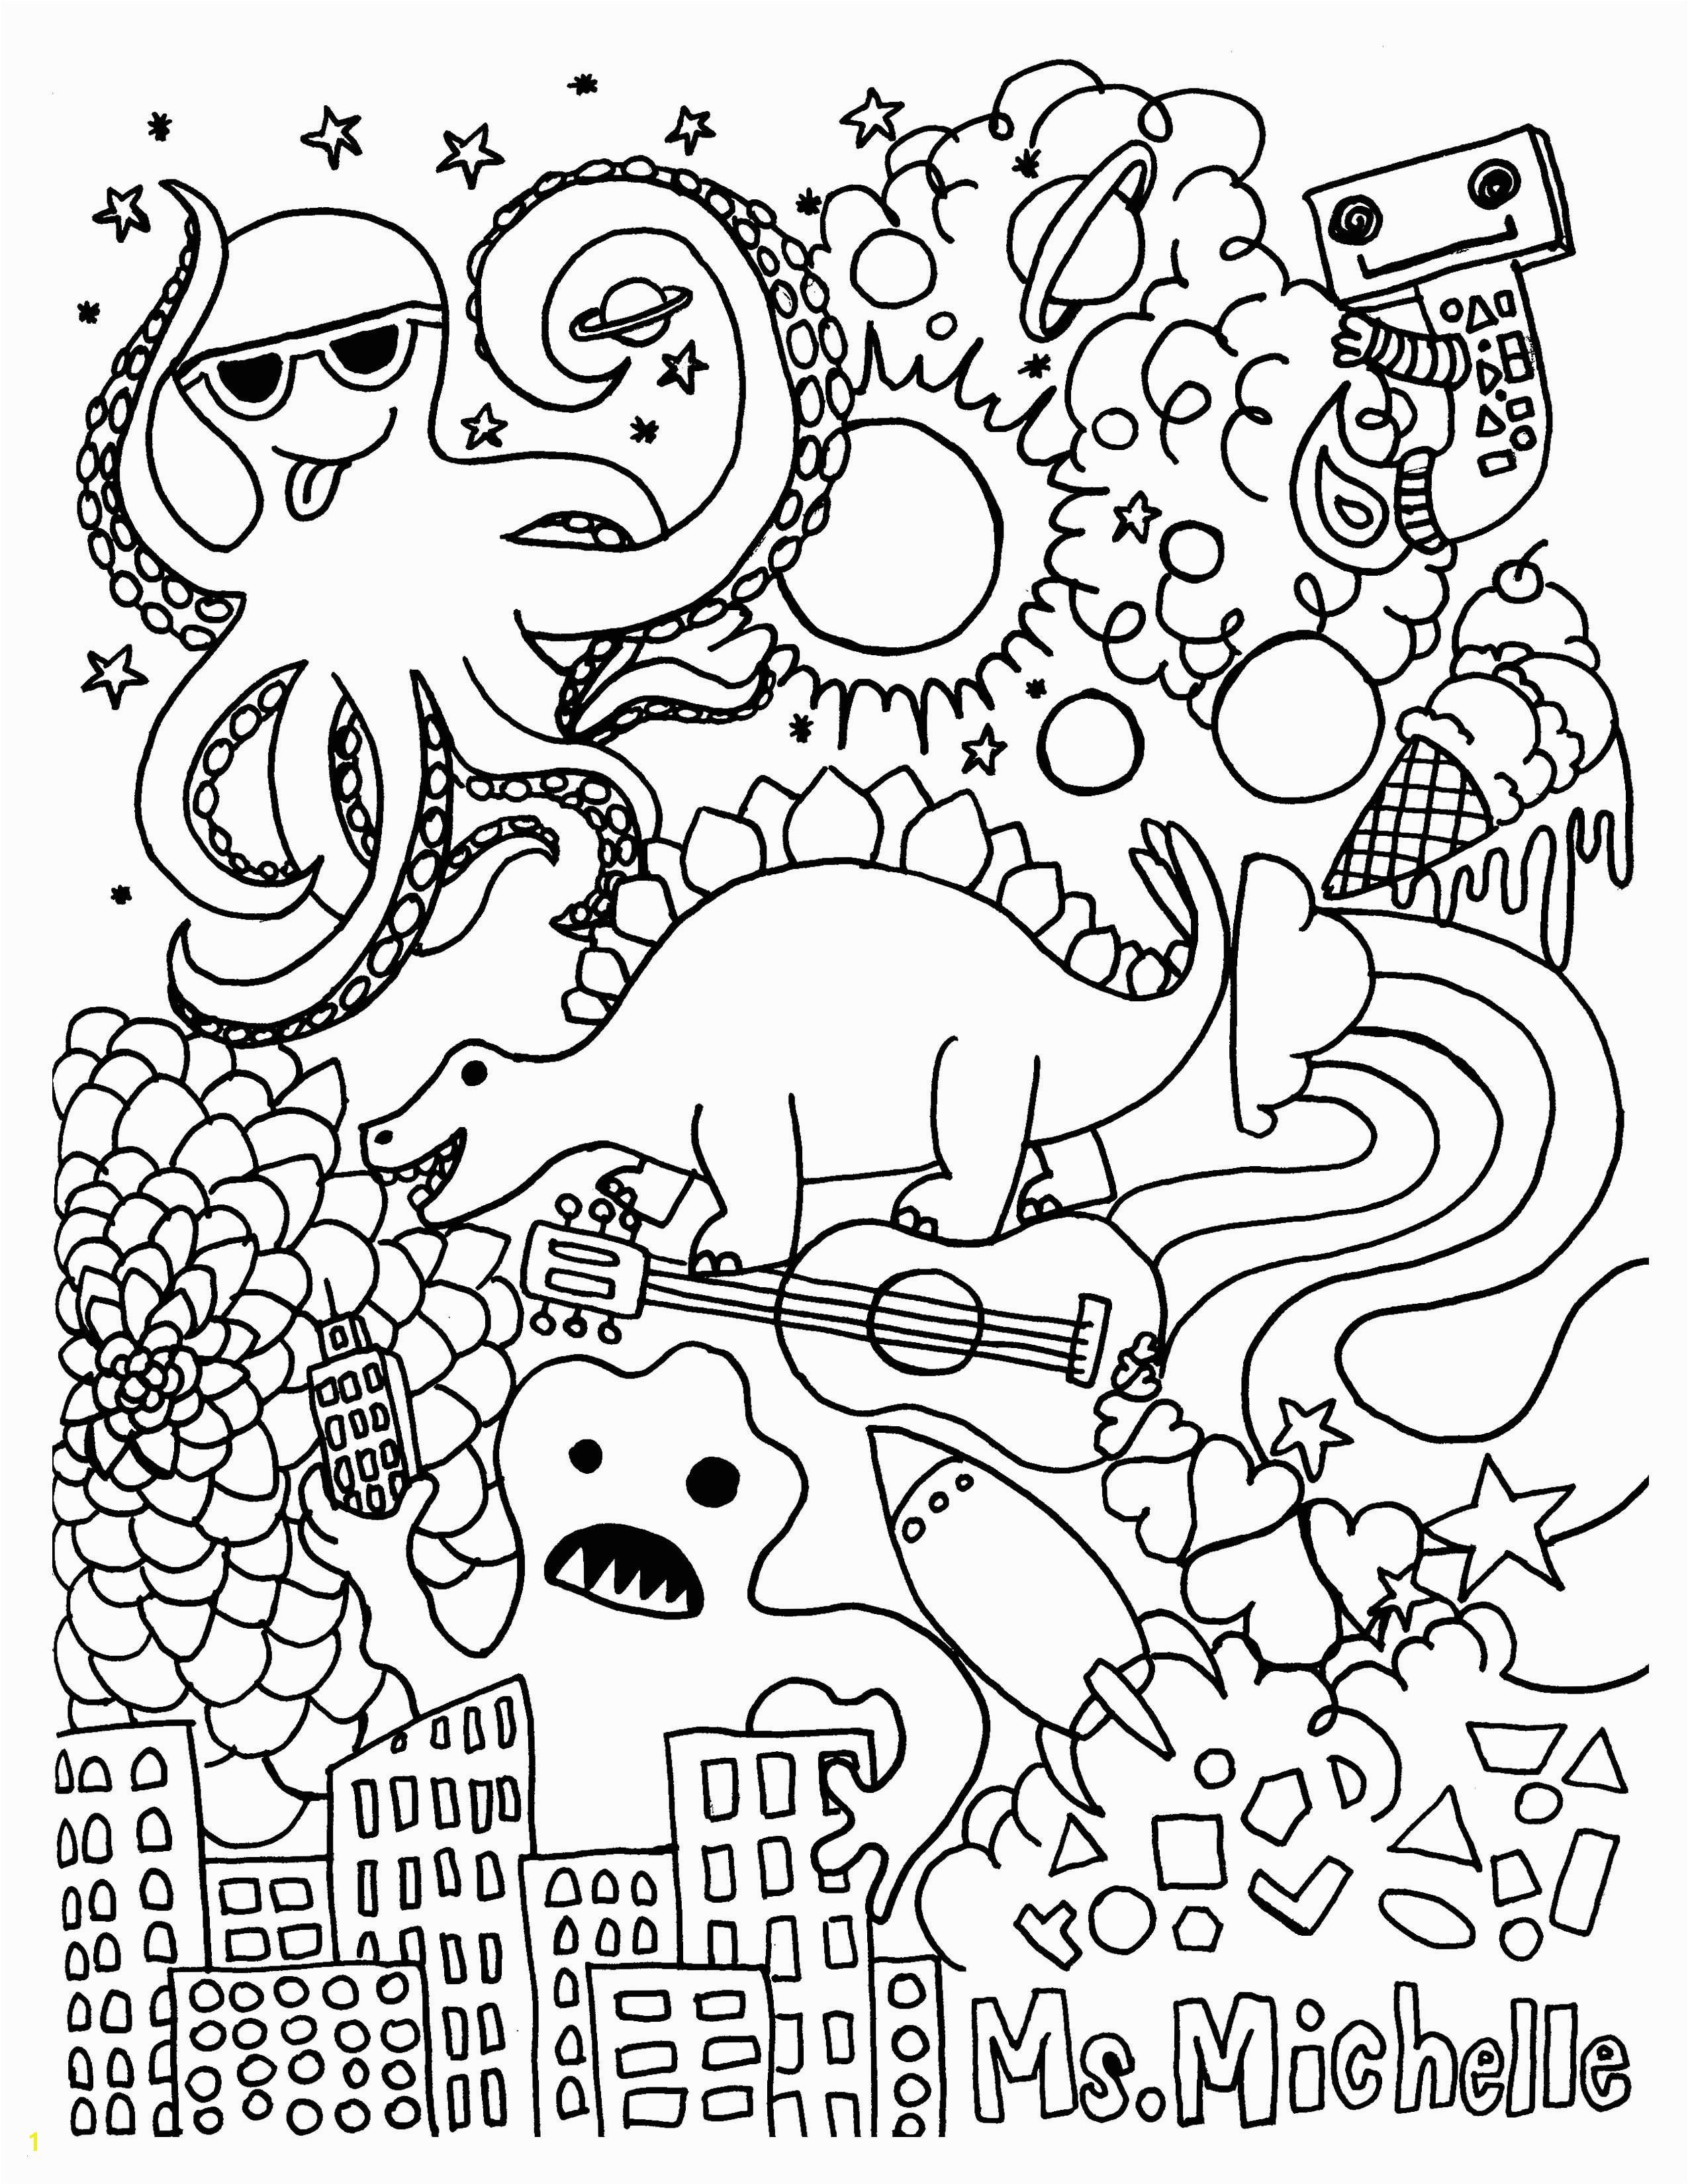 Uk Basketball Coloring Pages Unique Coloring Pages the whole Alphabet Katesgrove